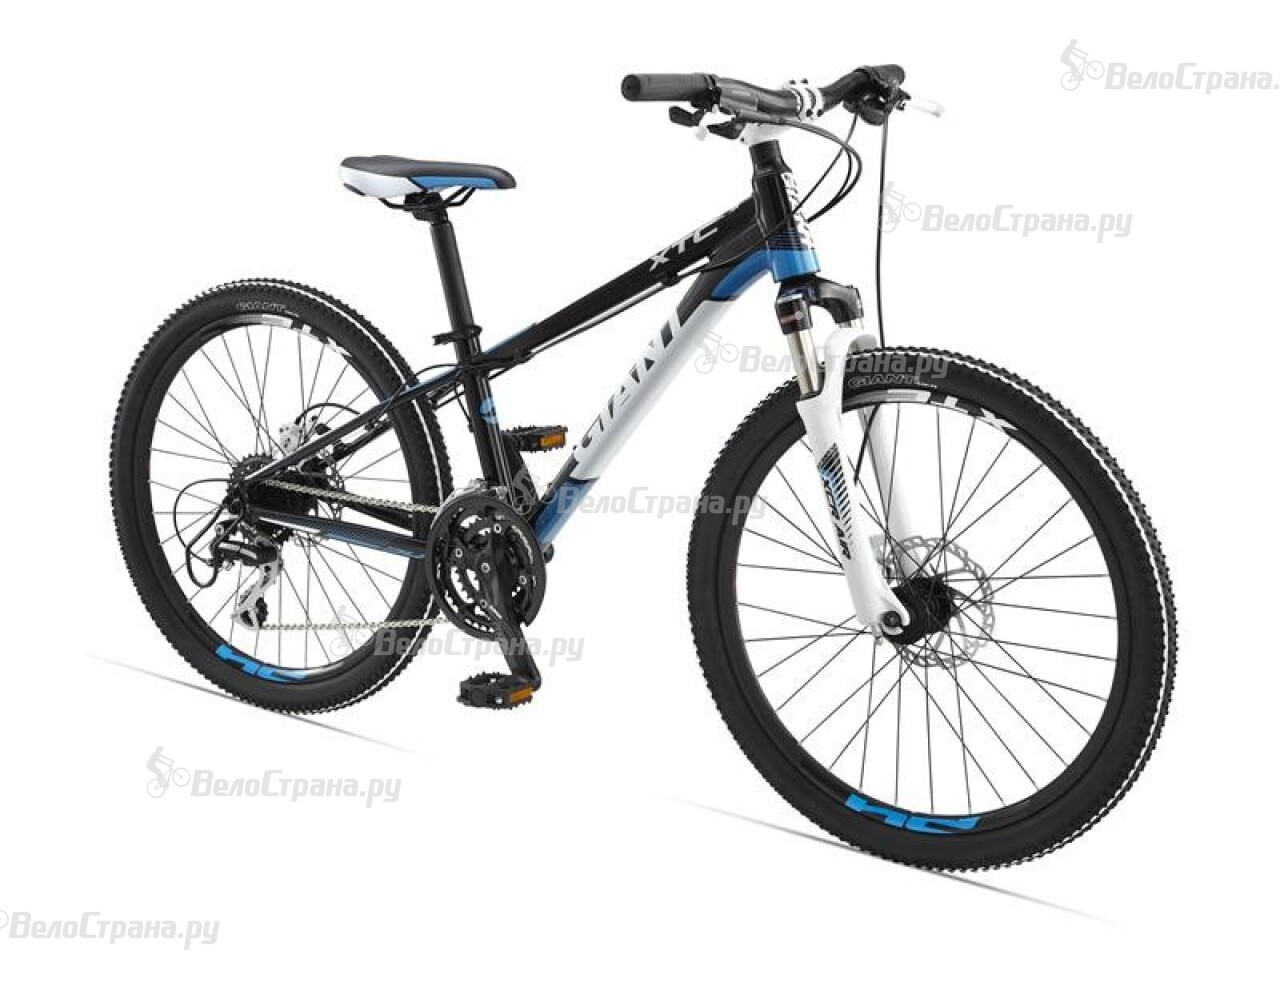 Велосипед Giant XtC SL Jr 24 (2015) велосипед детский giant xtc jr 2 2015 цвет черный колесо 24